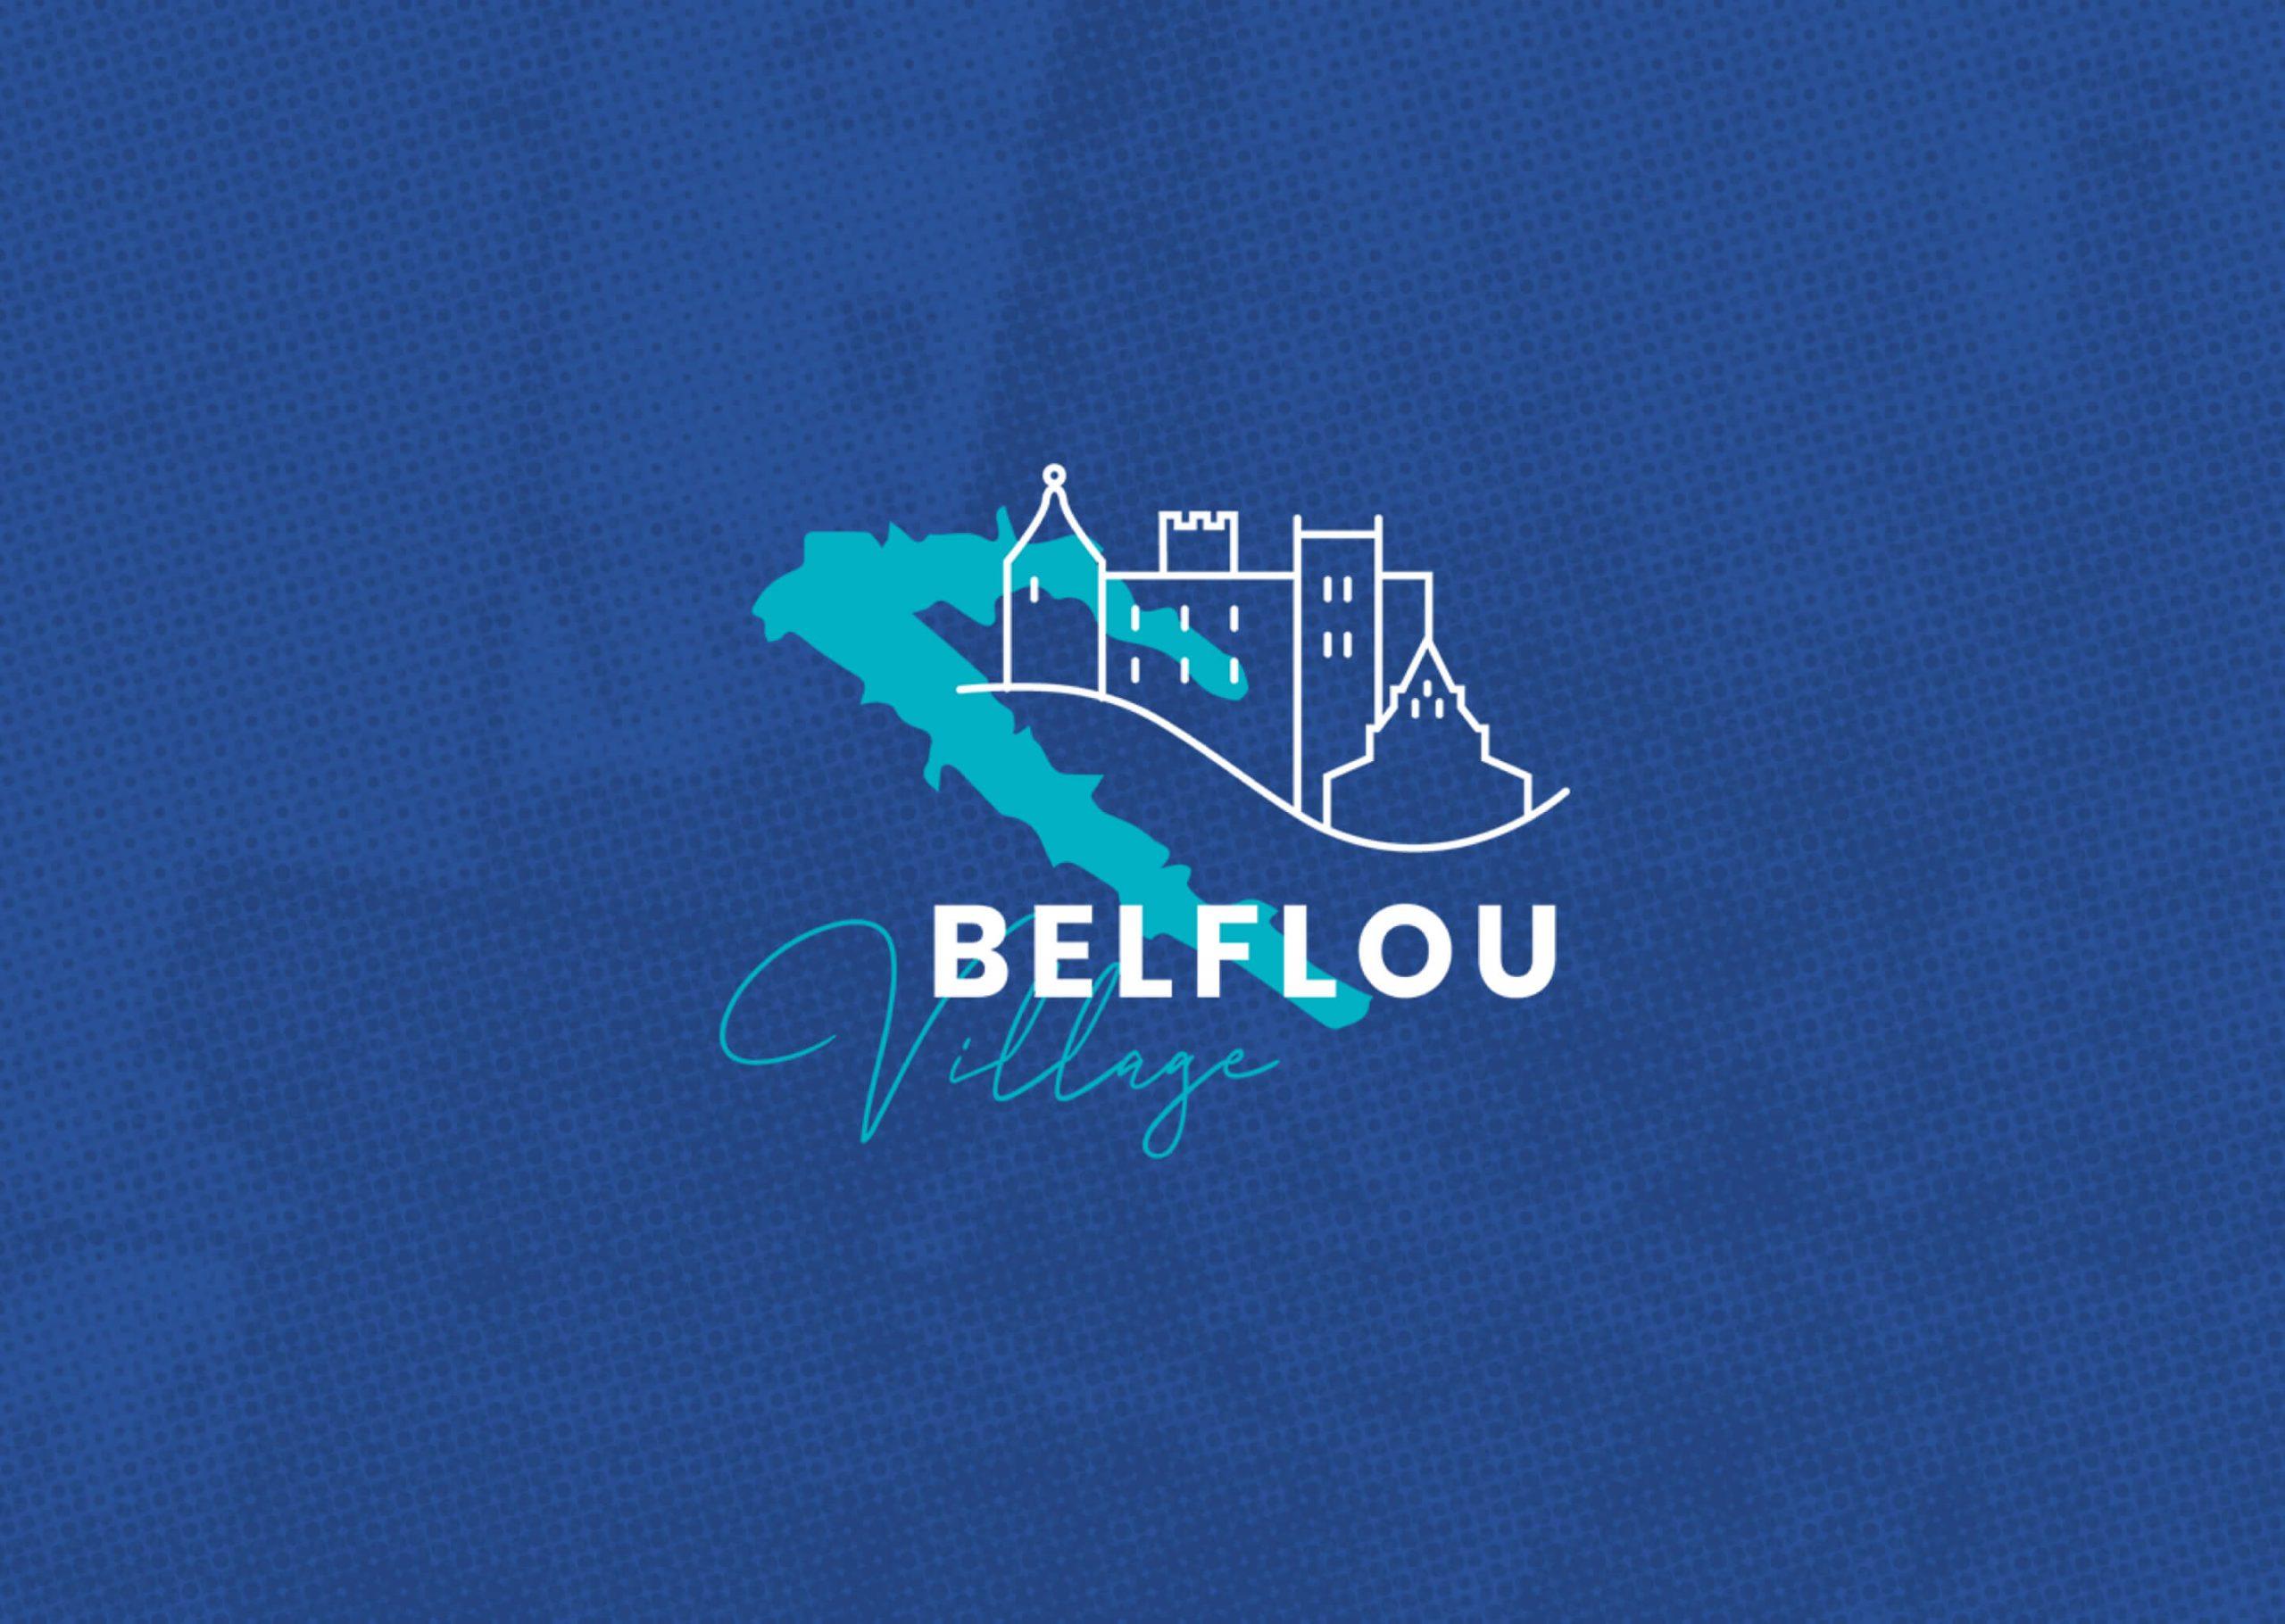 Belflou logo